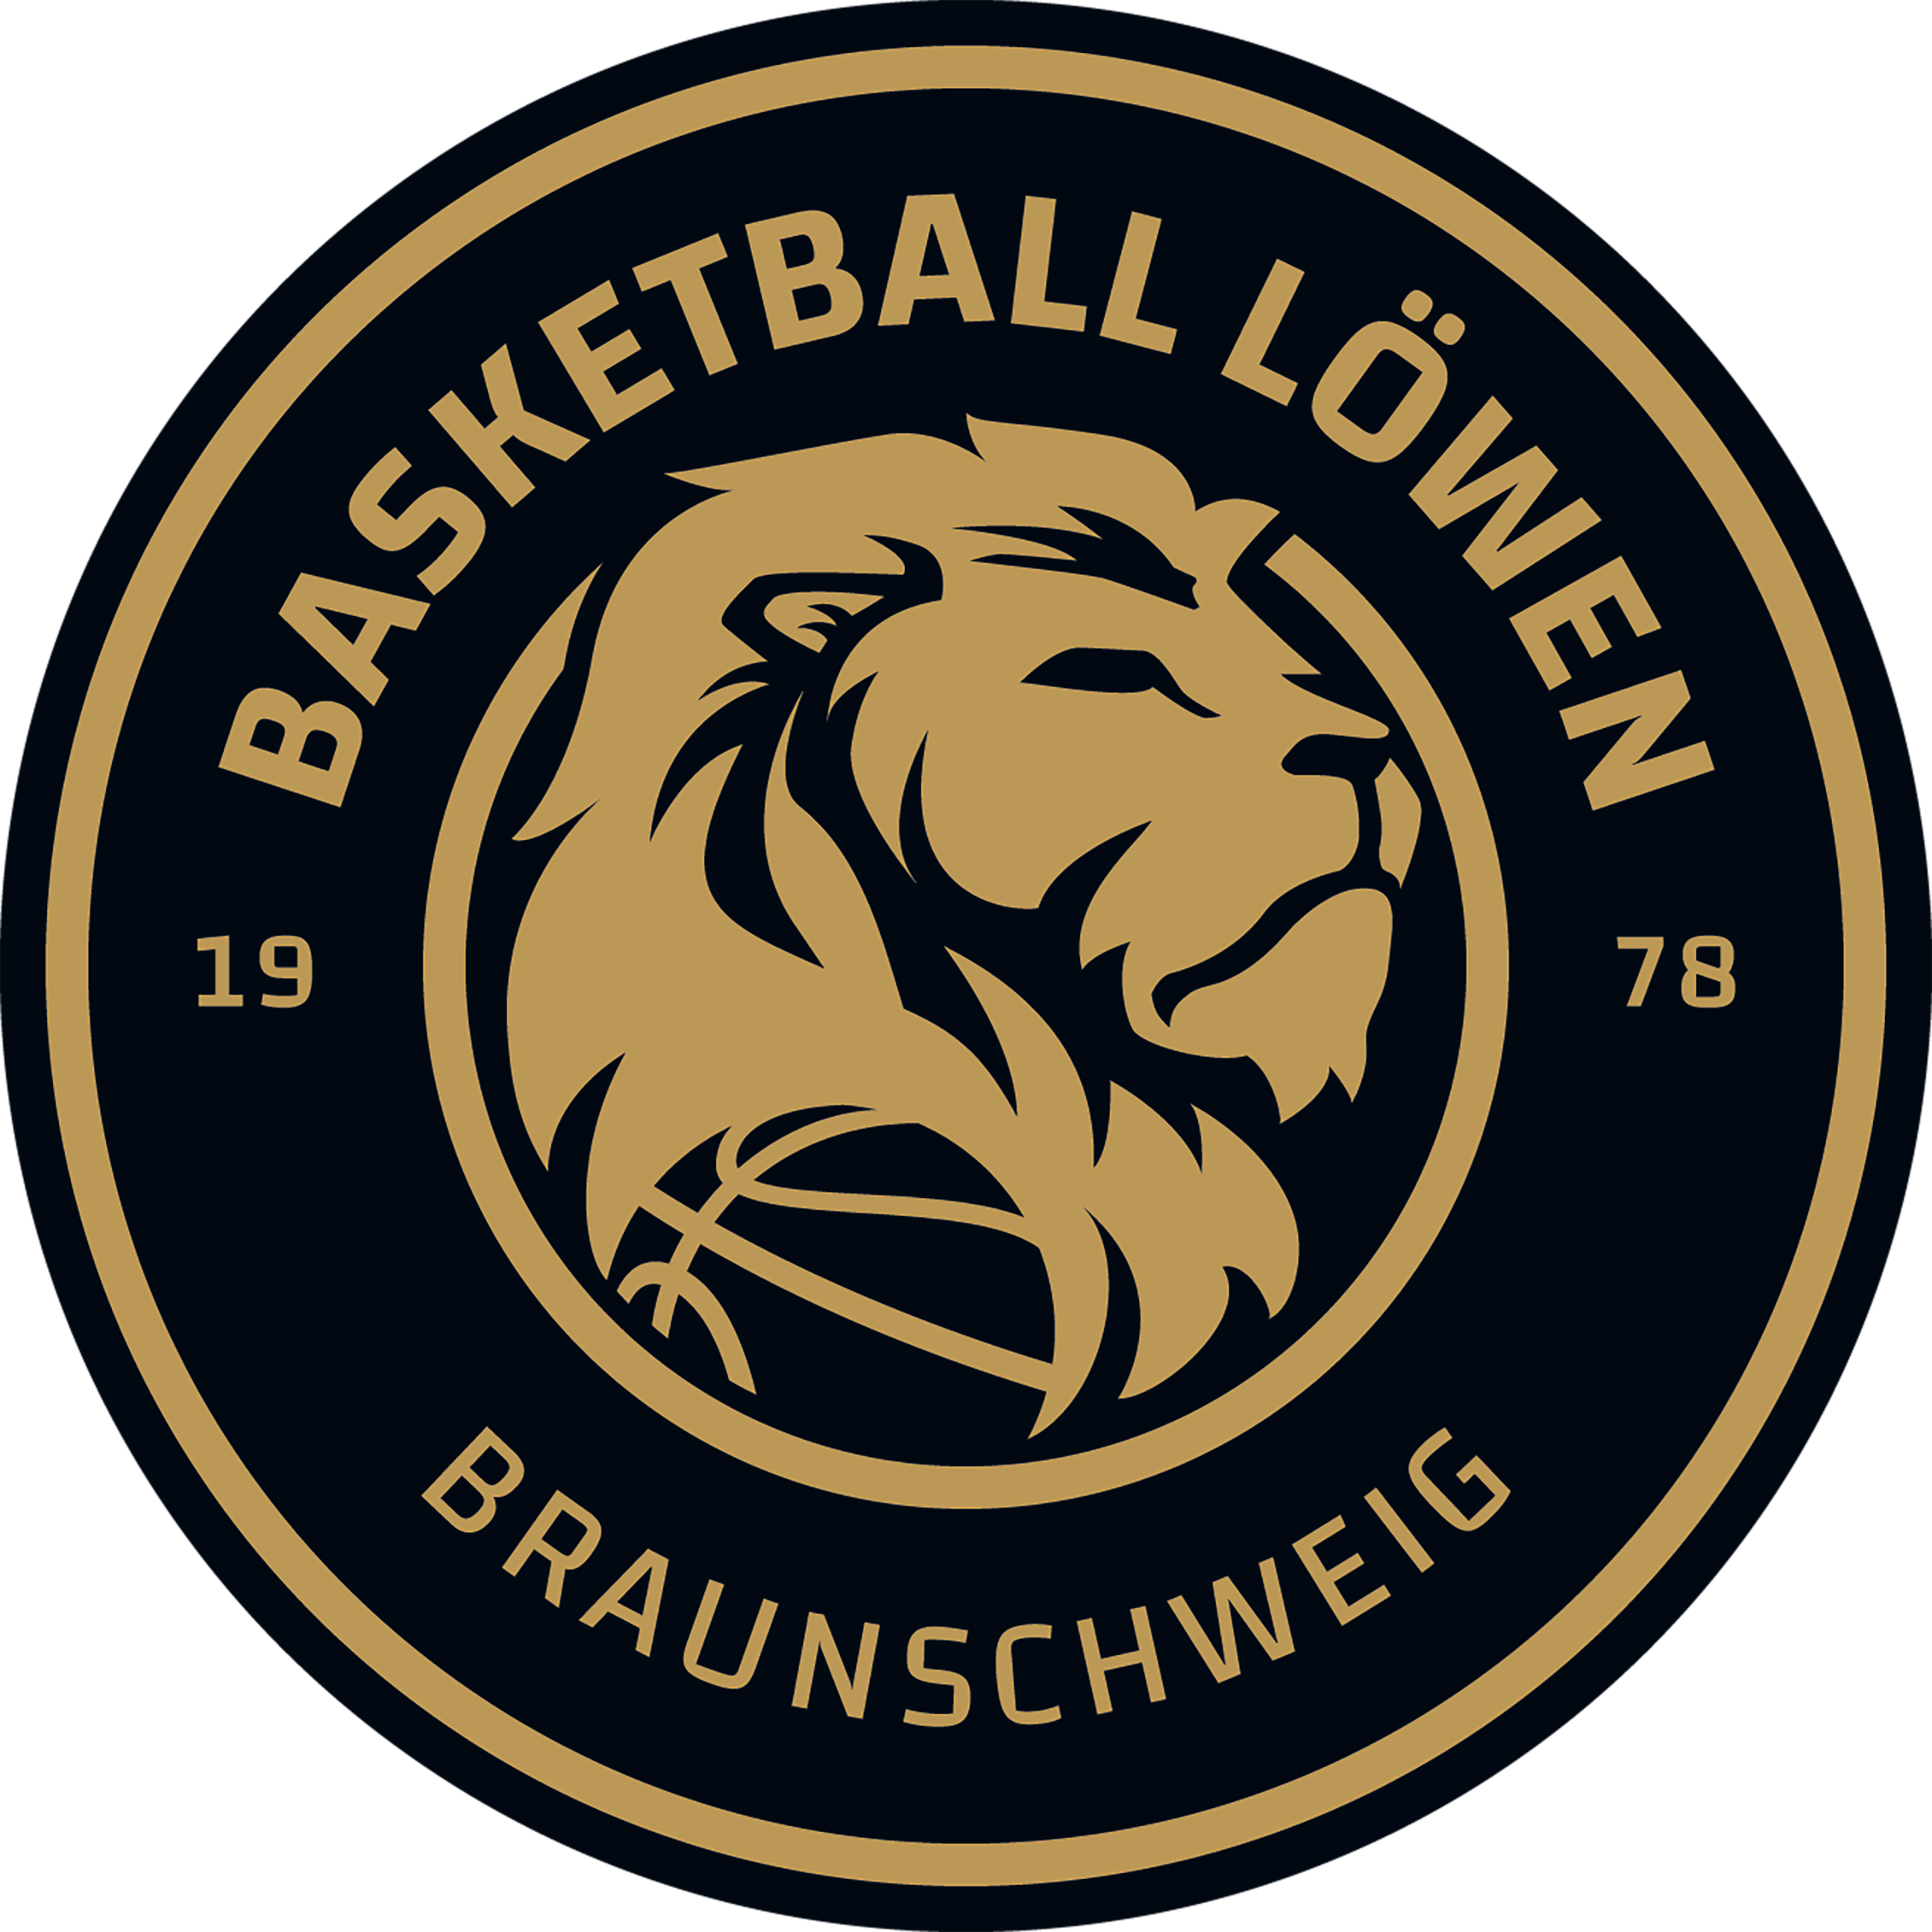 Braunschweig Löwen Basketball